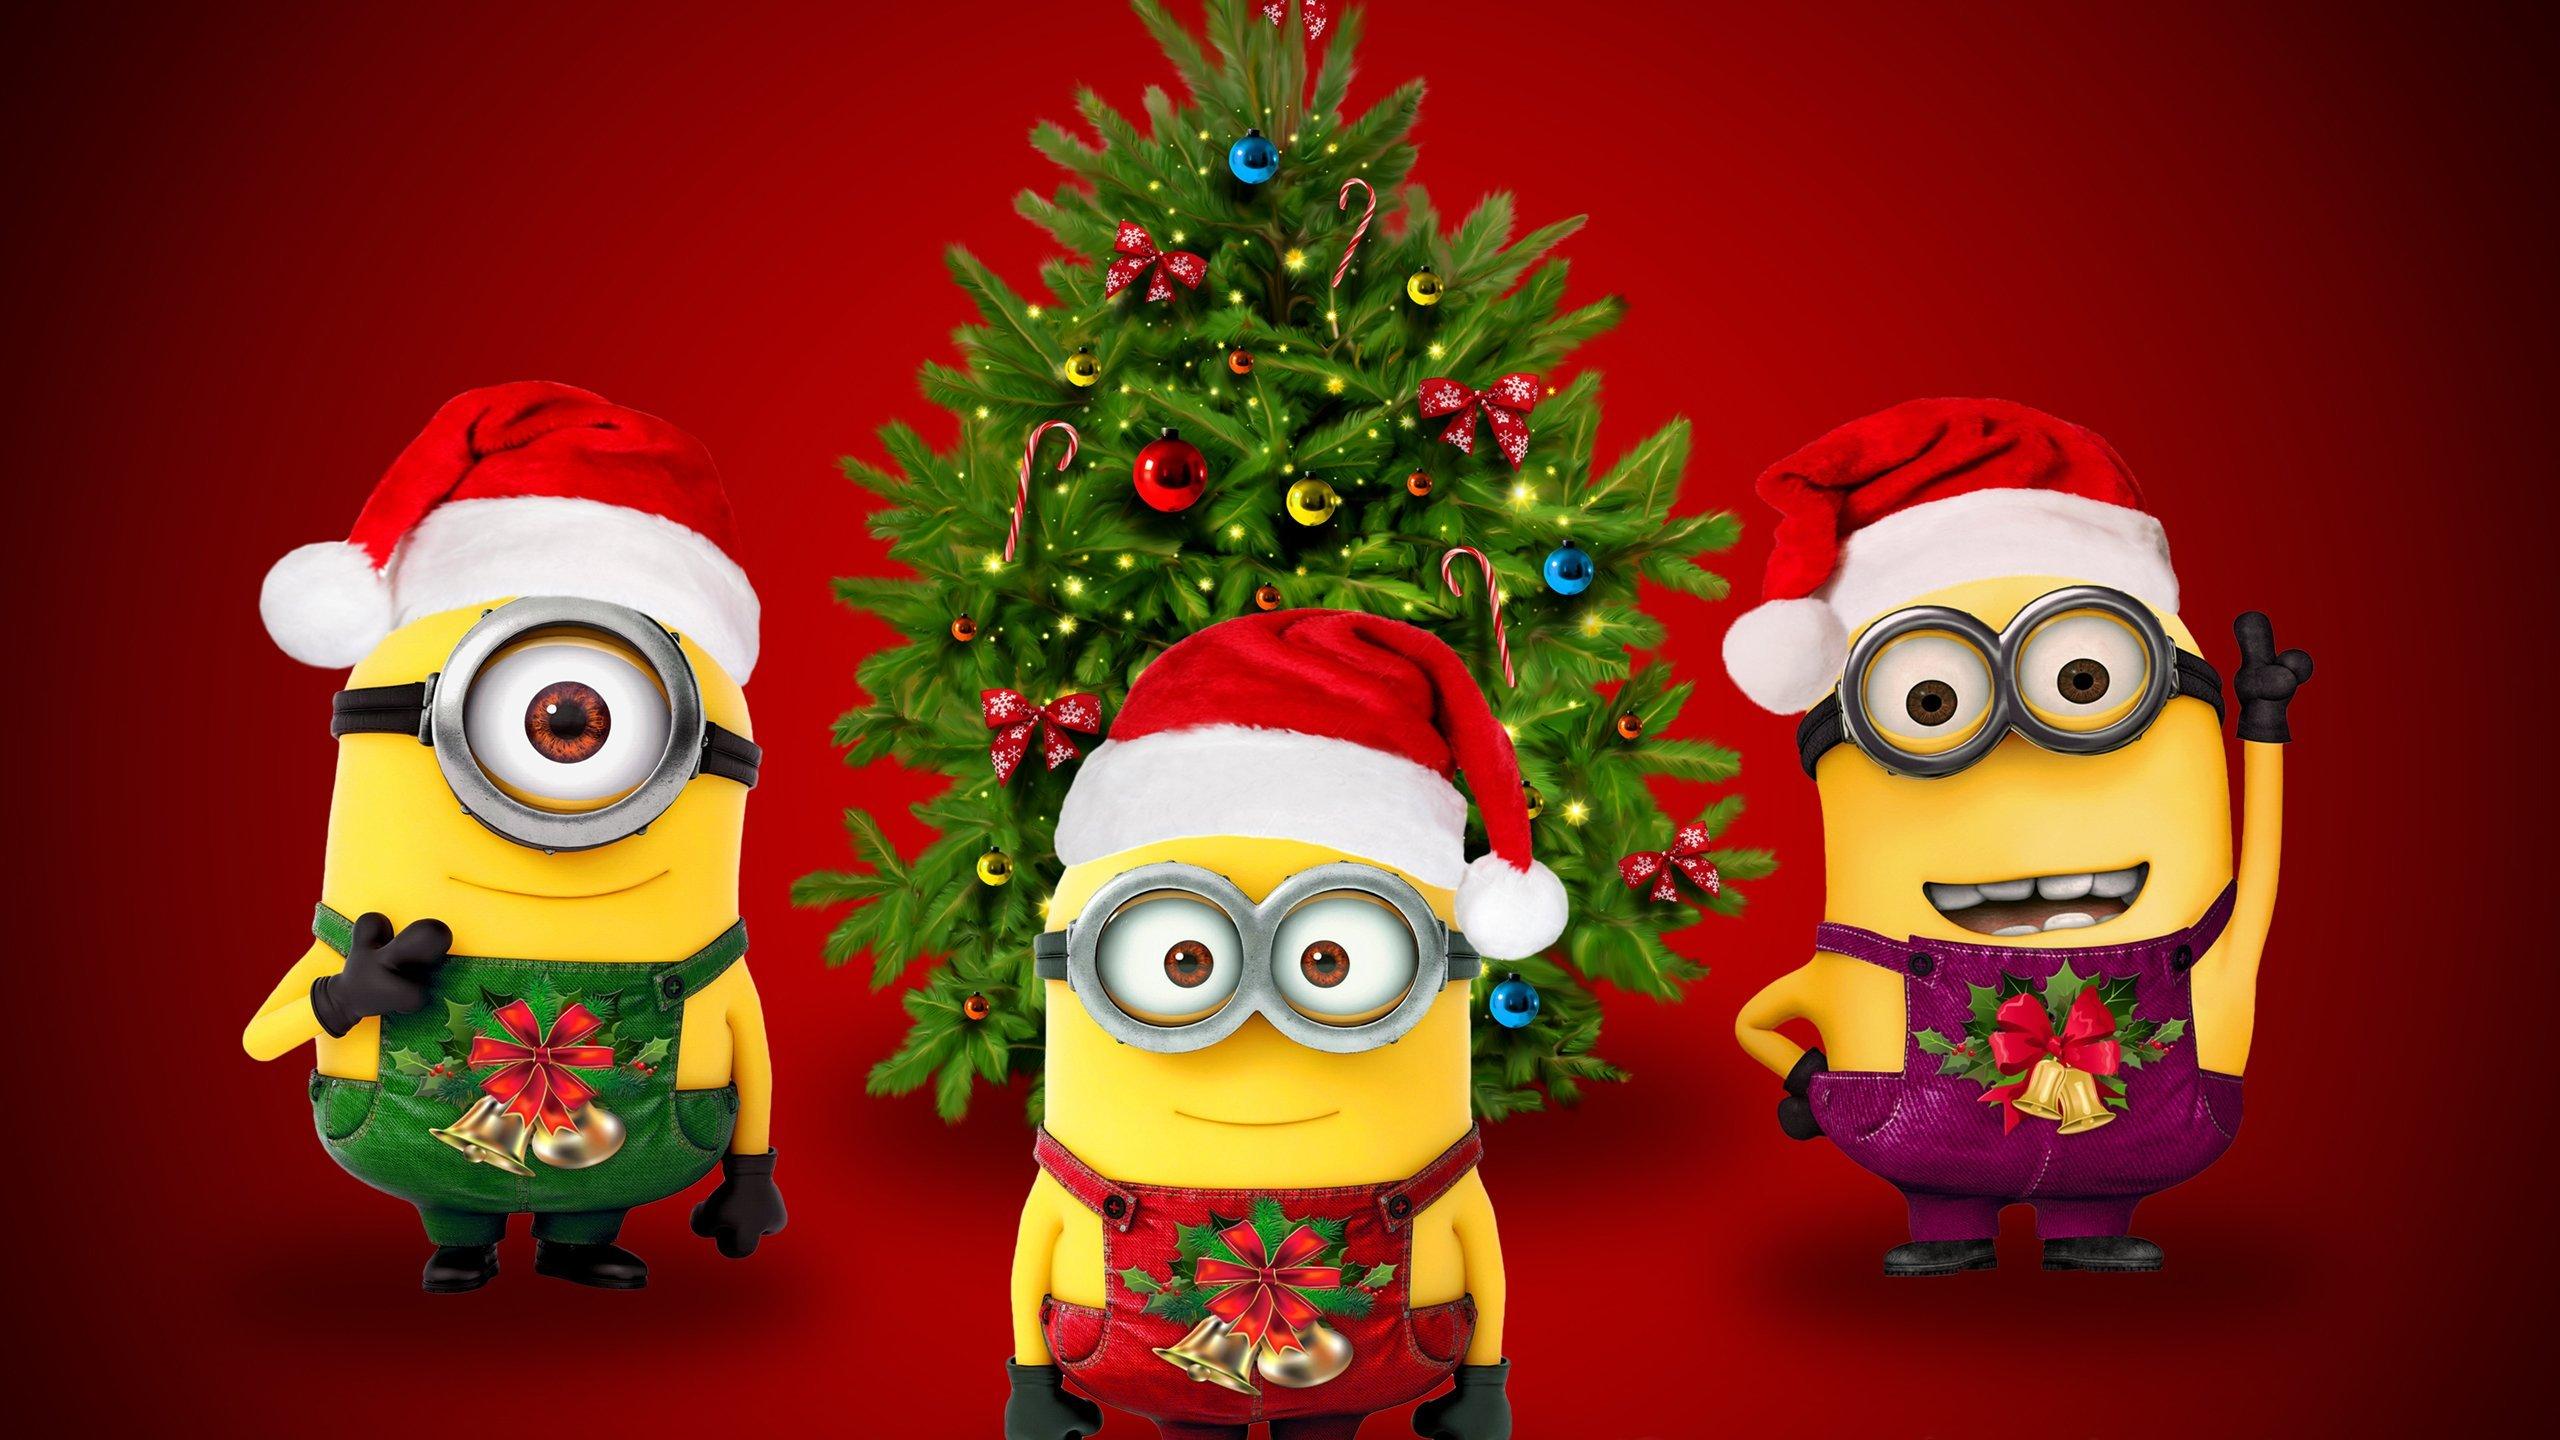 Wallpaper 2560x1440 Px Christmas Holiday 2560x1440 Wallbase 1315635 Hd Wallpapers Wallhere